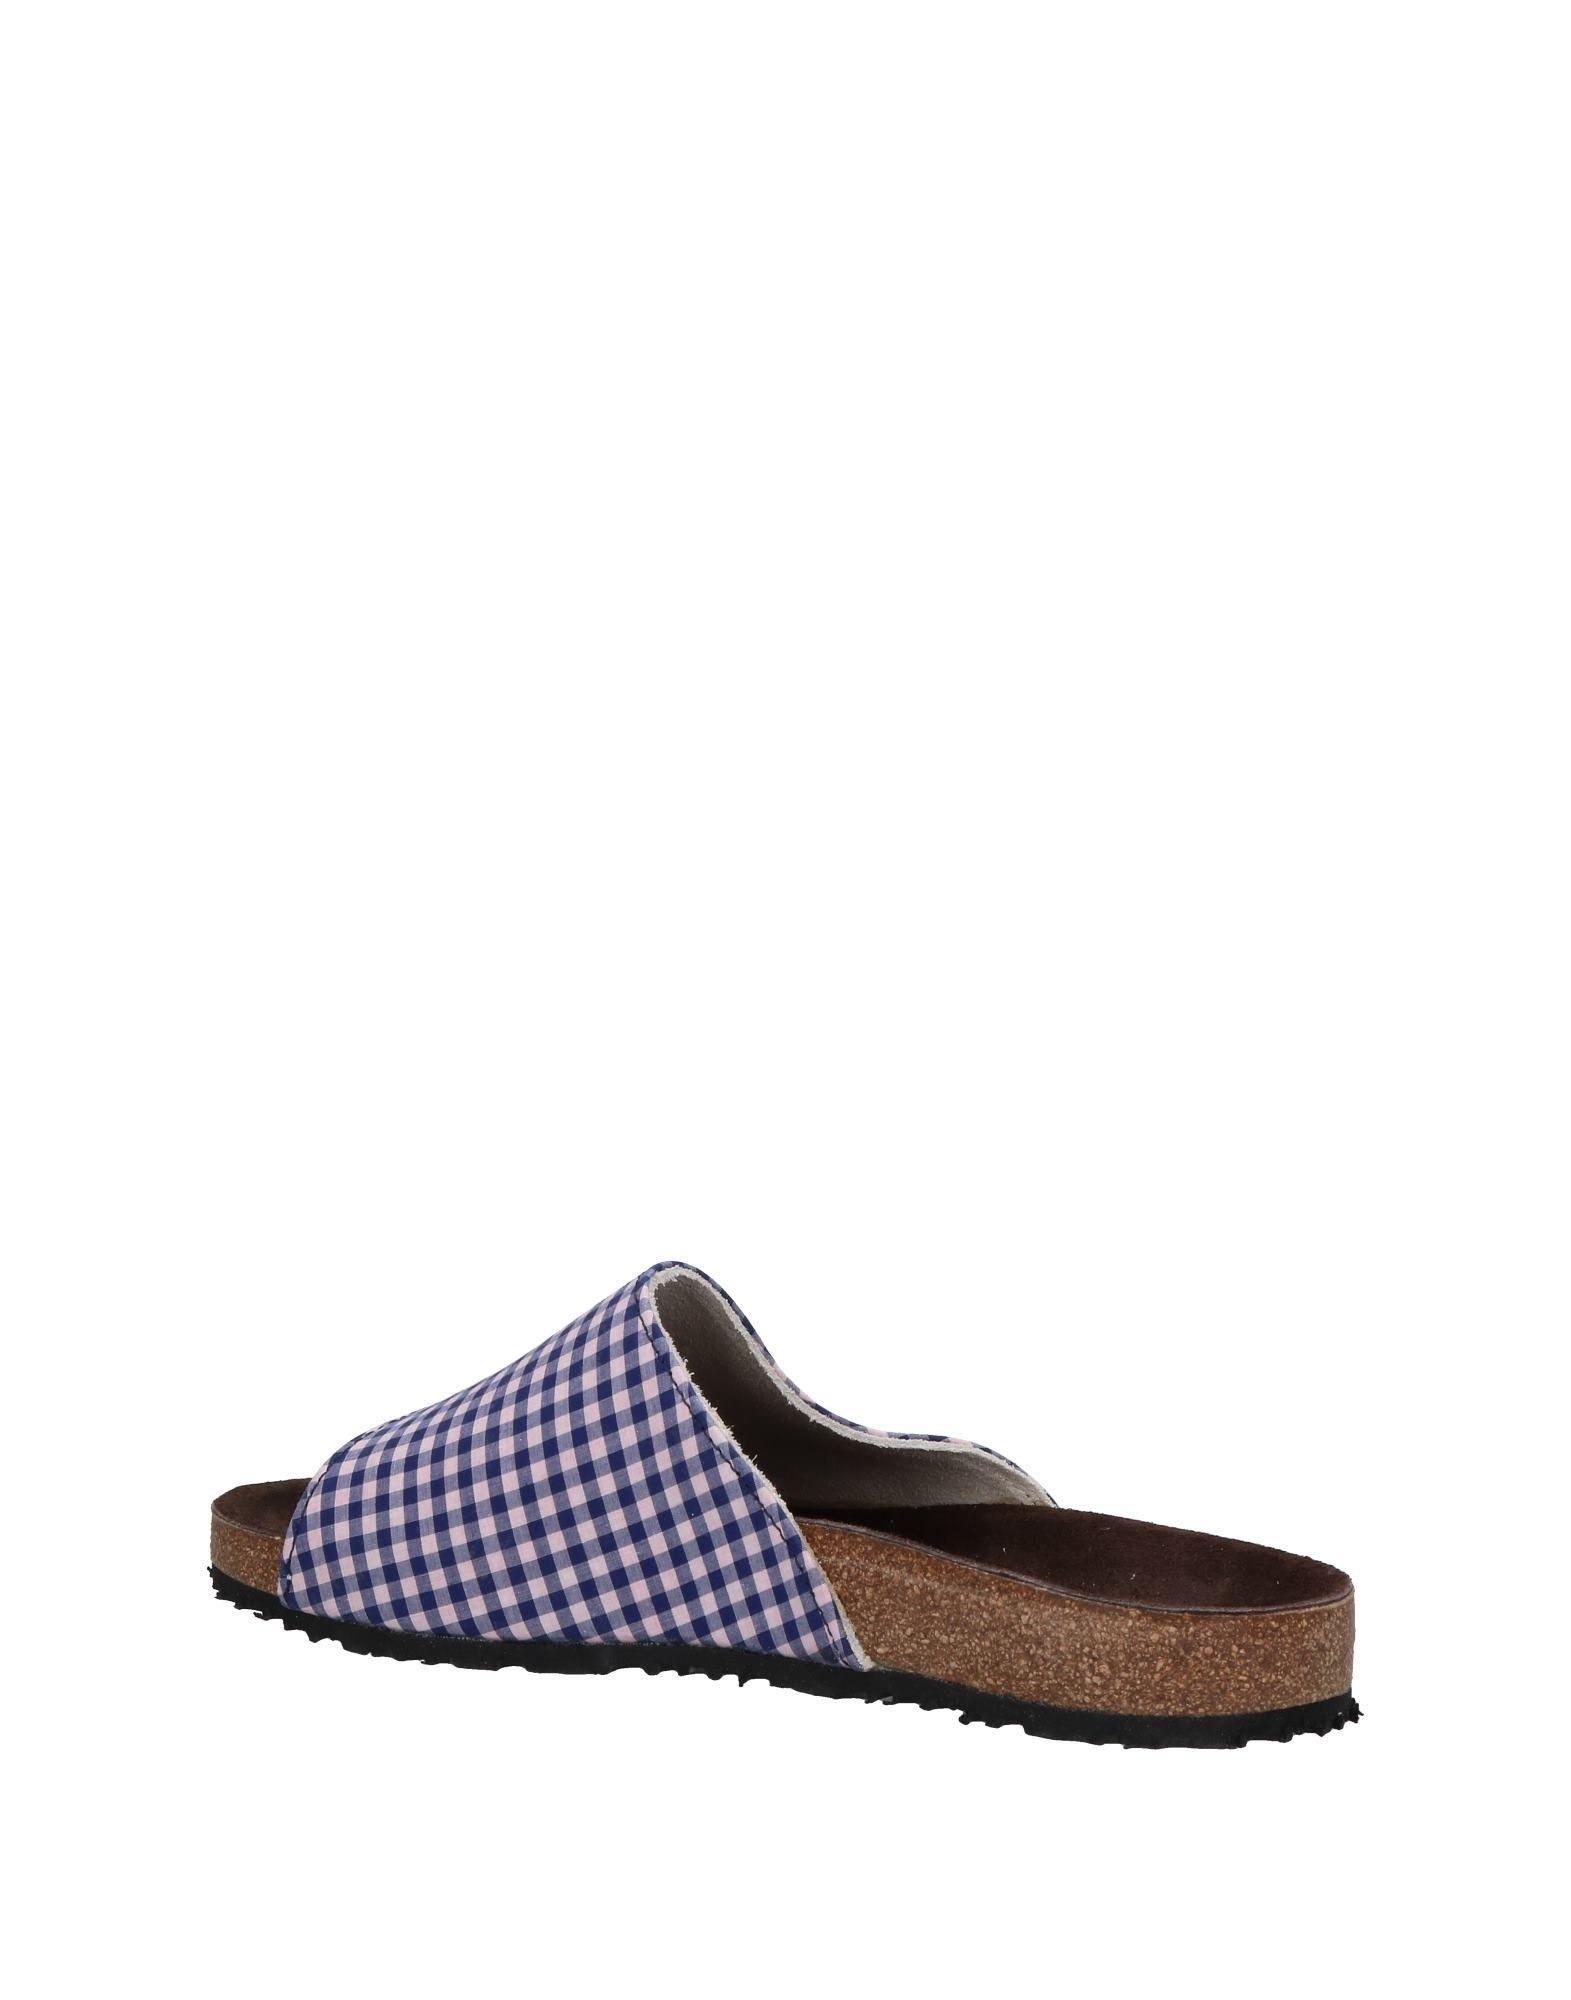 FOOTWEAR - Sandals Momoni ruKjoW5